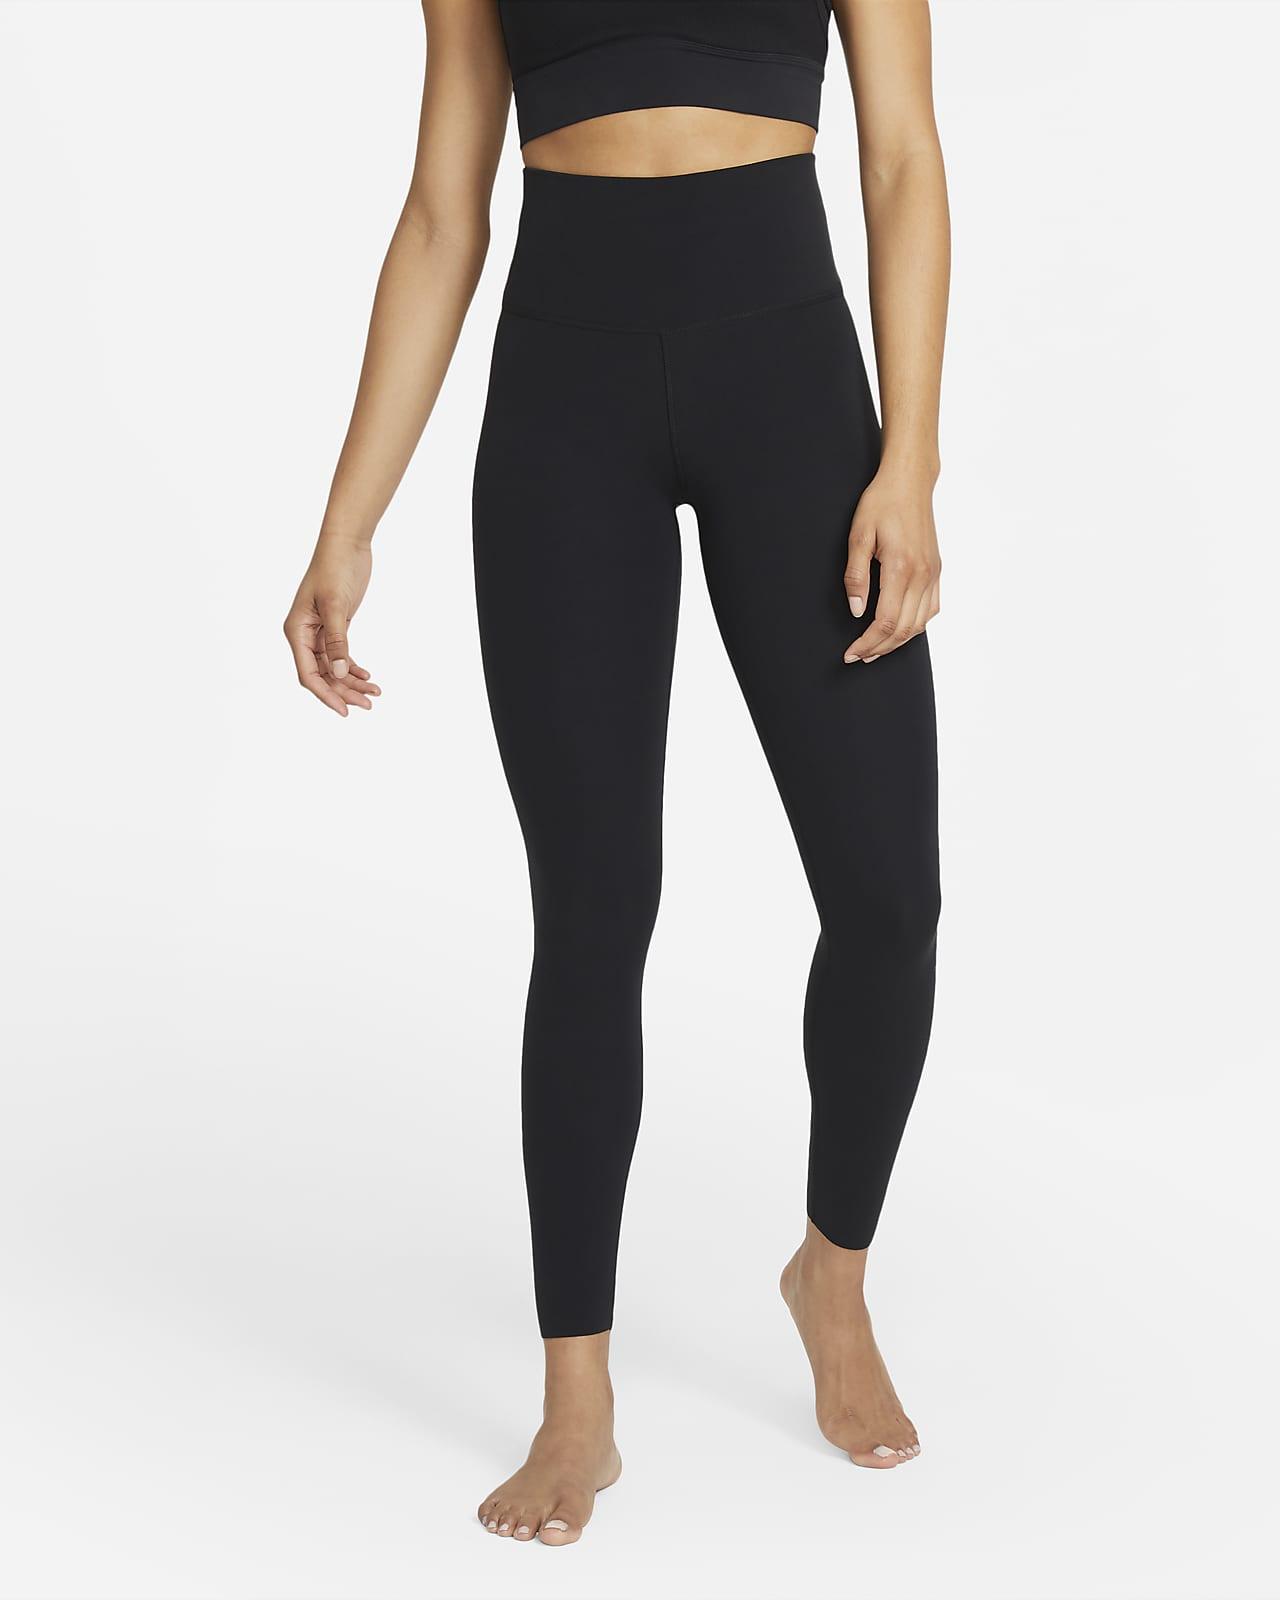 Nike Yoga Luxe Women's Leggings